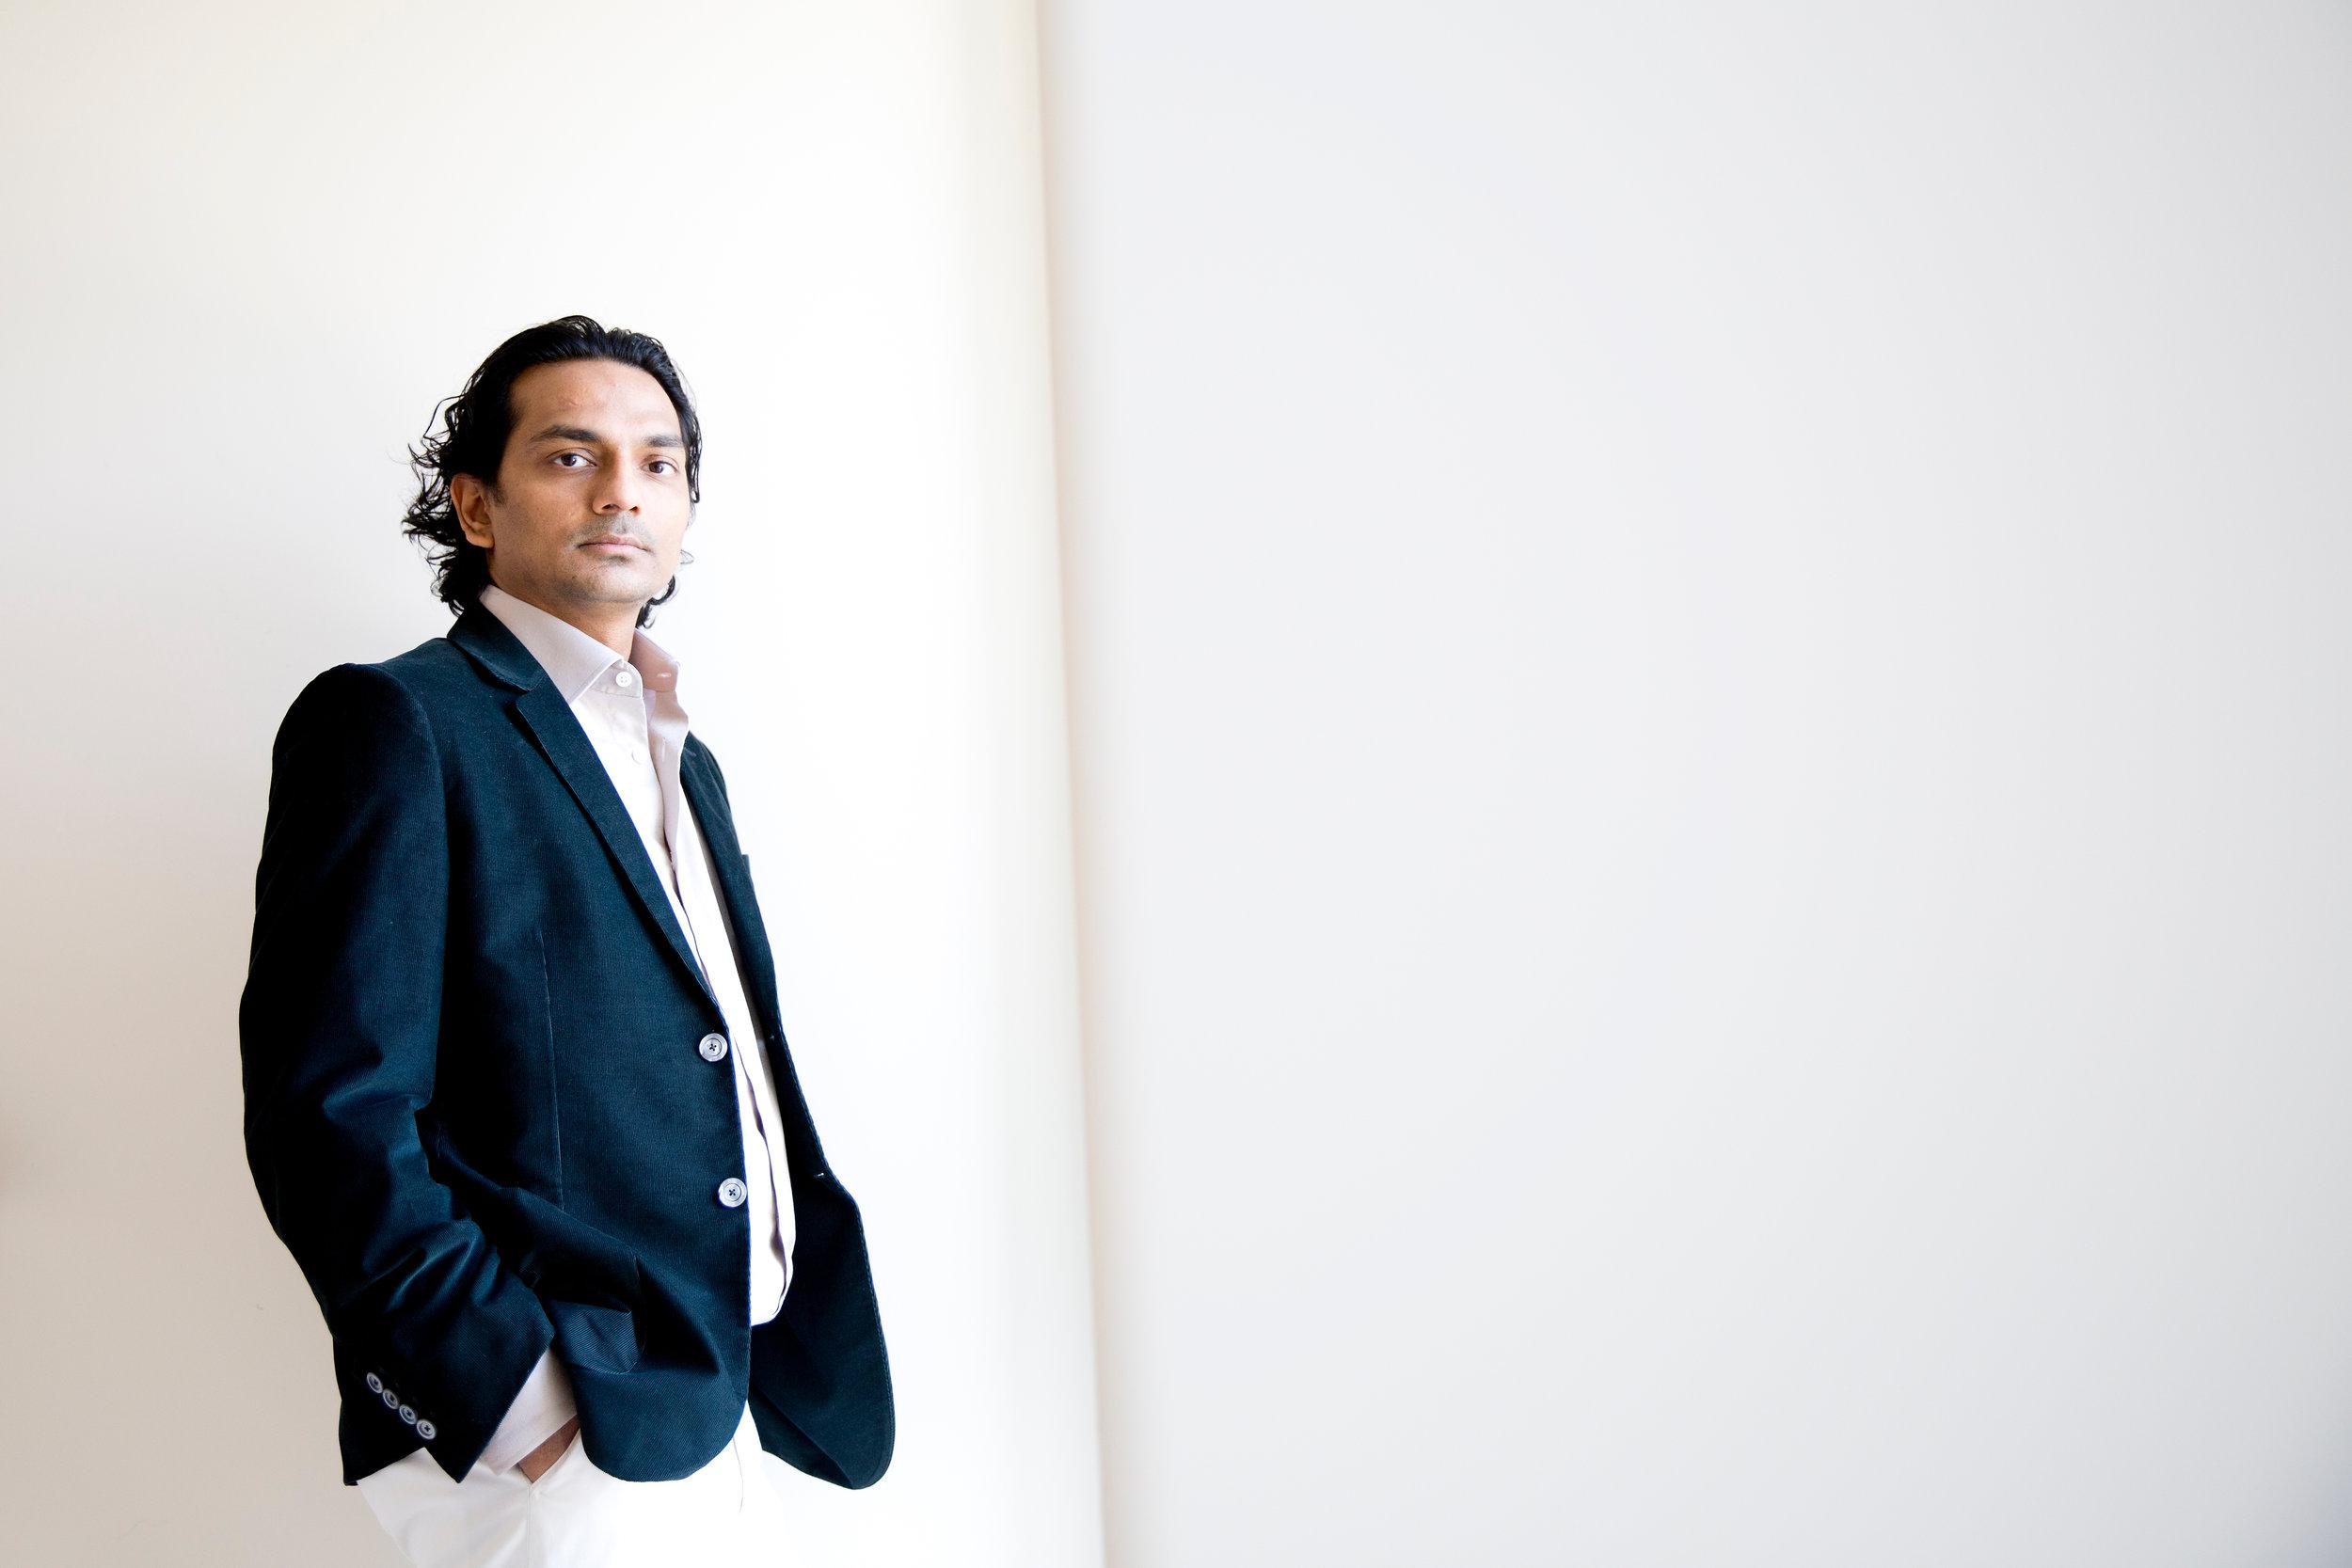 Billionaire and serial entrepreneur Divyank Turakhia.